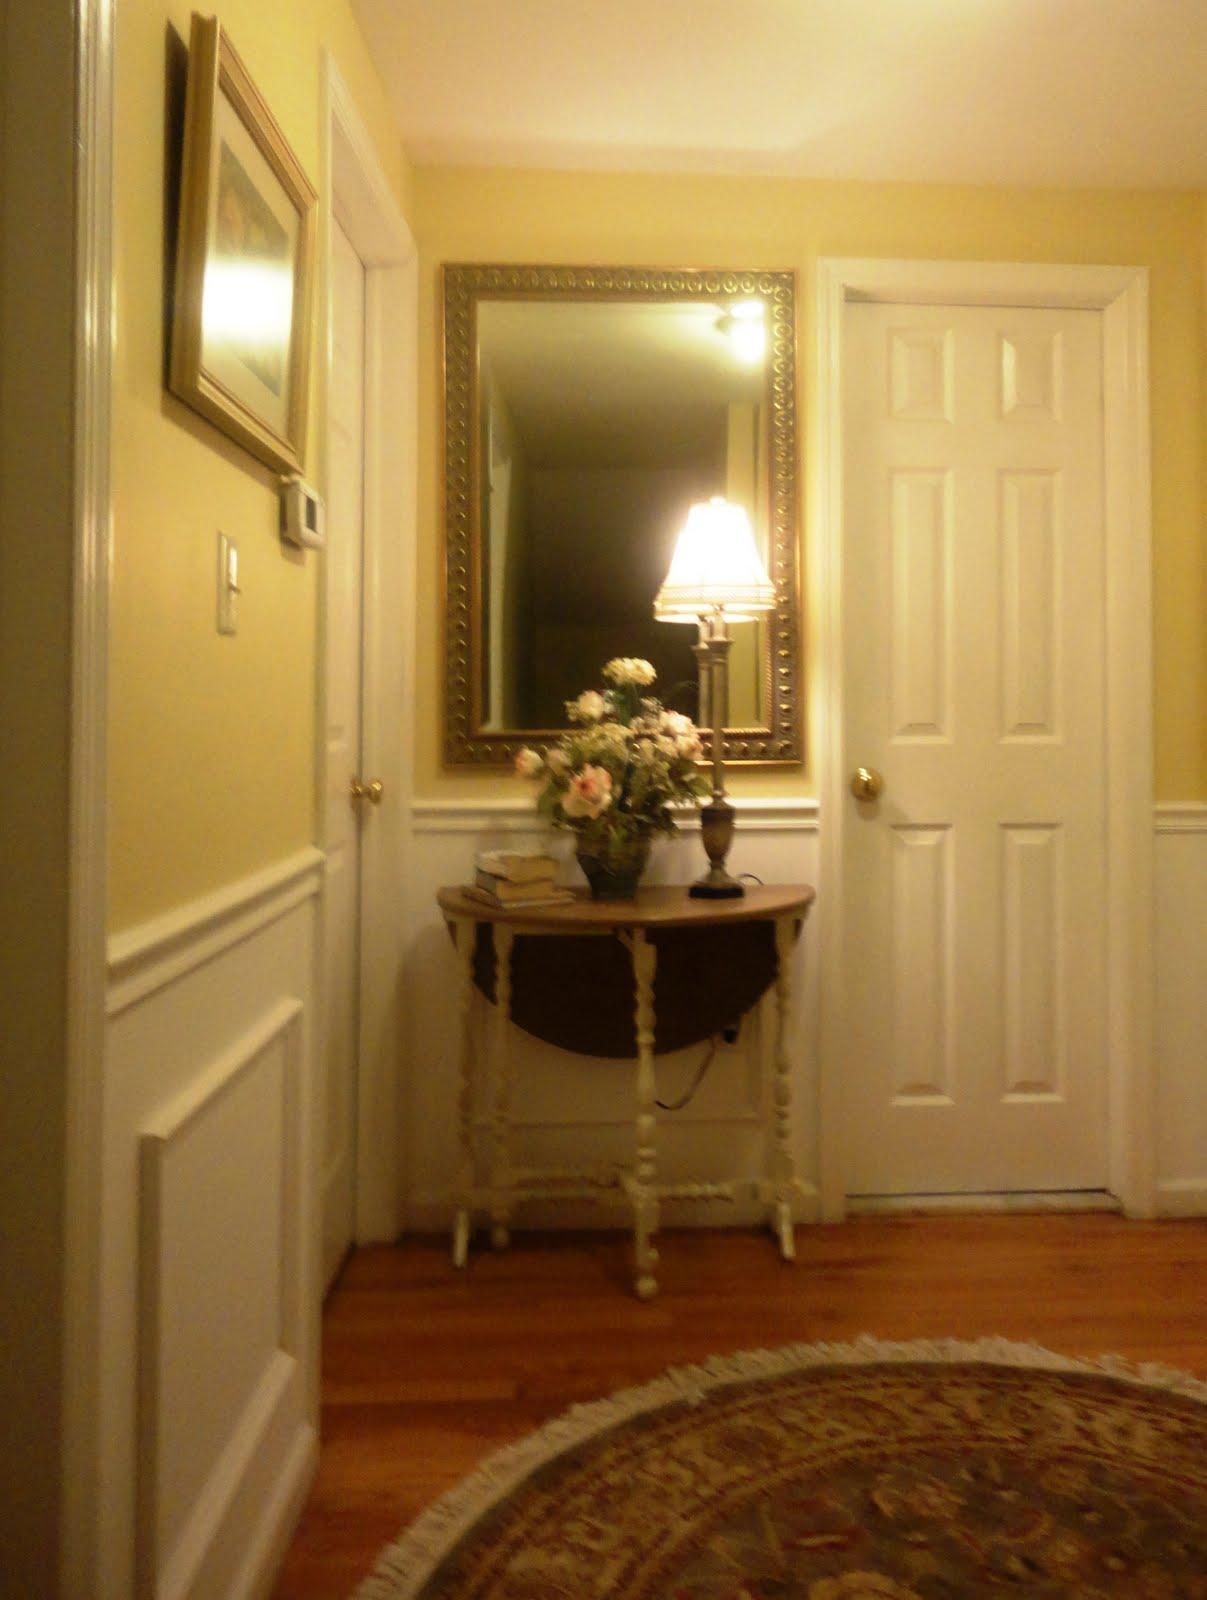 21 Rosemary Lane: Sprucing Up the Upstairs Hallway